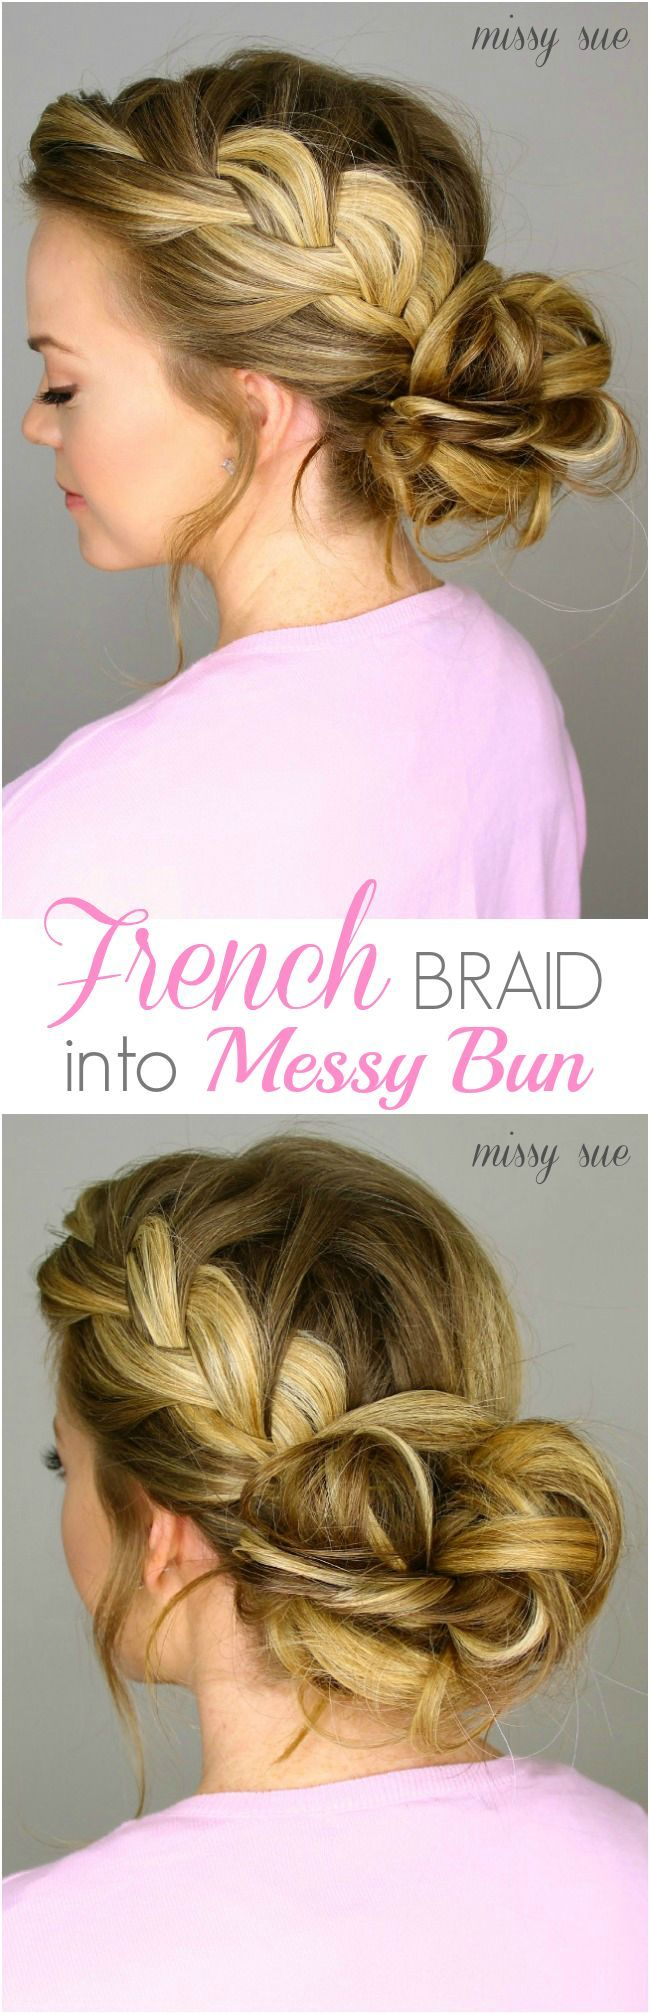 15 Braided Bun Hair Tutorials For Diy Projects